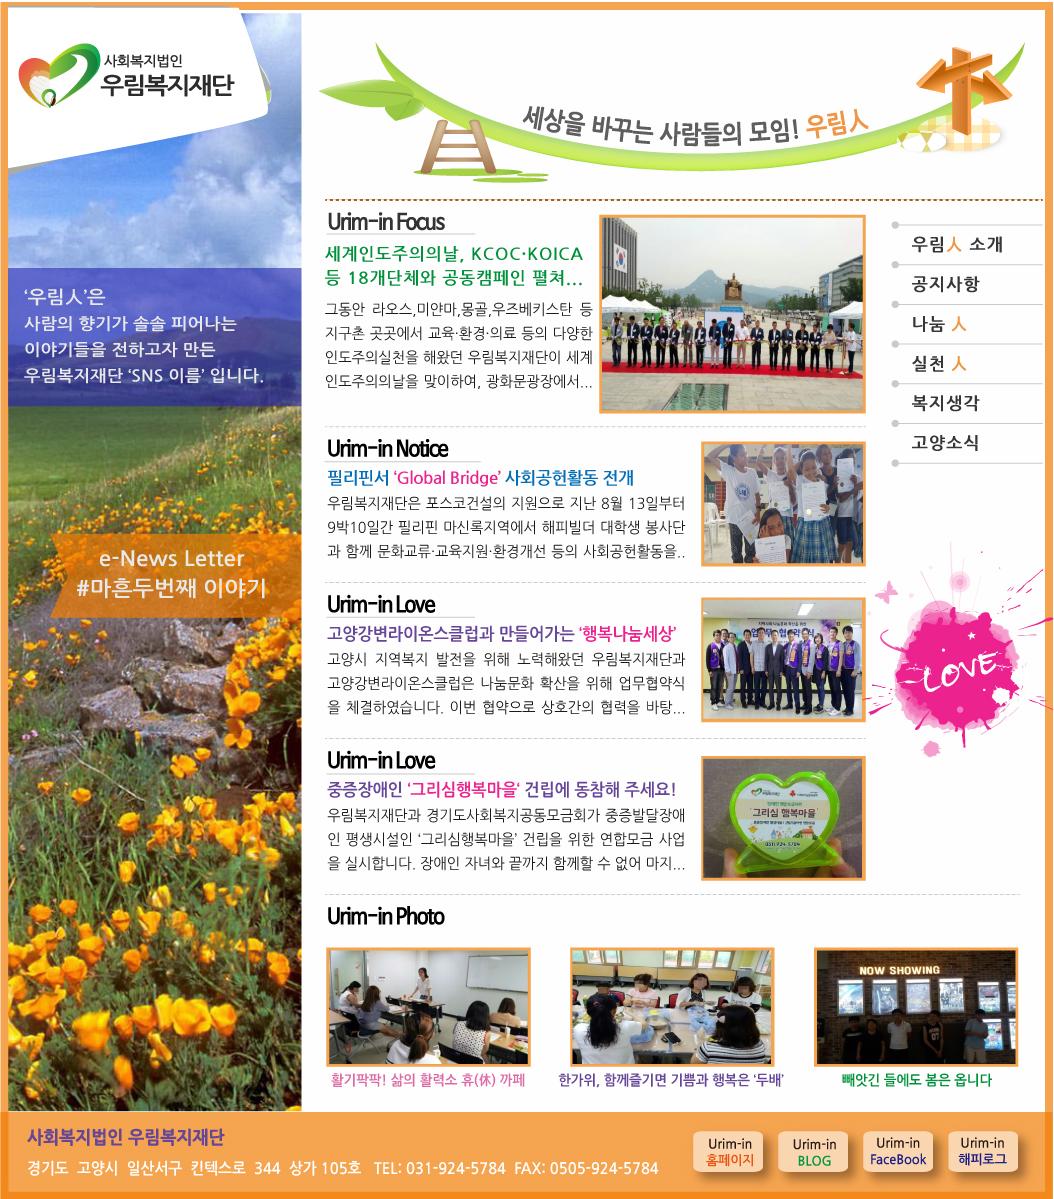 webzine_urimin_42.jpg